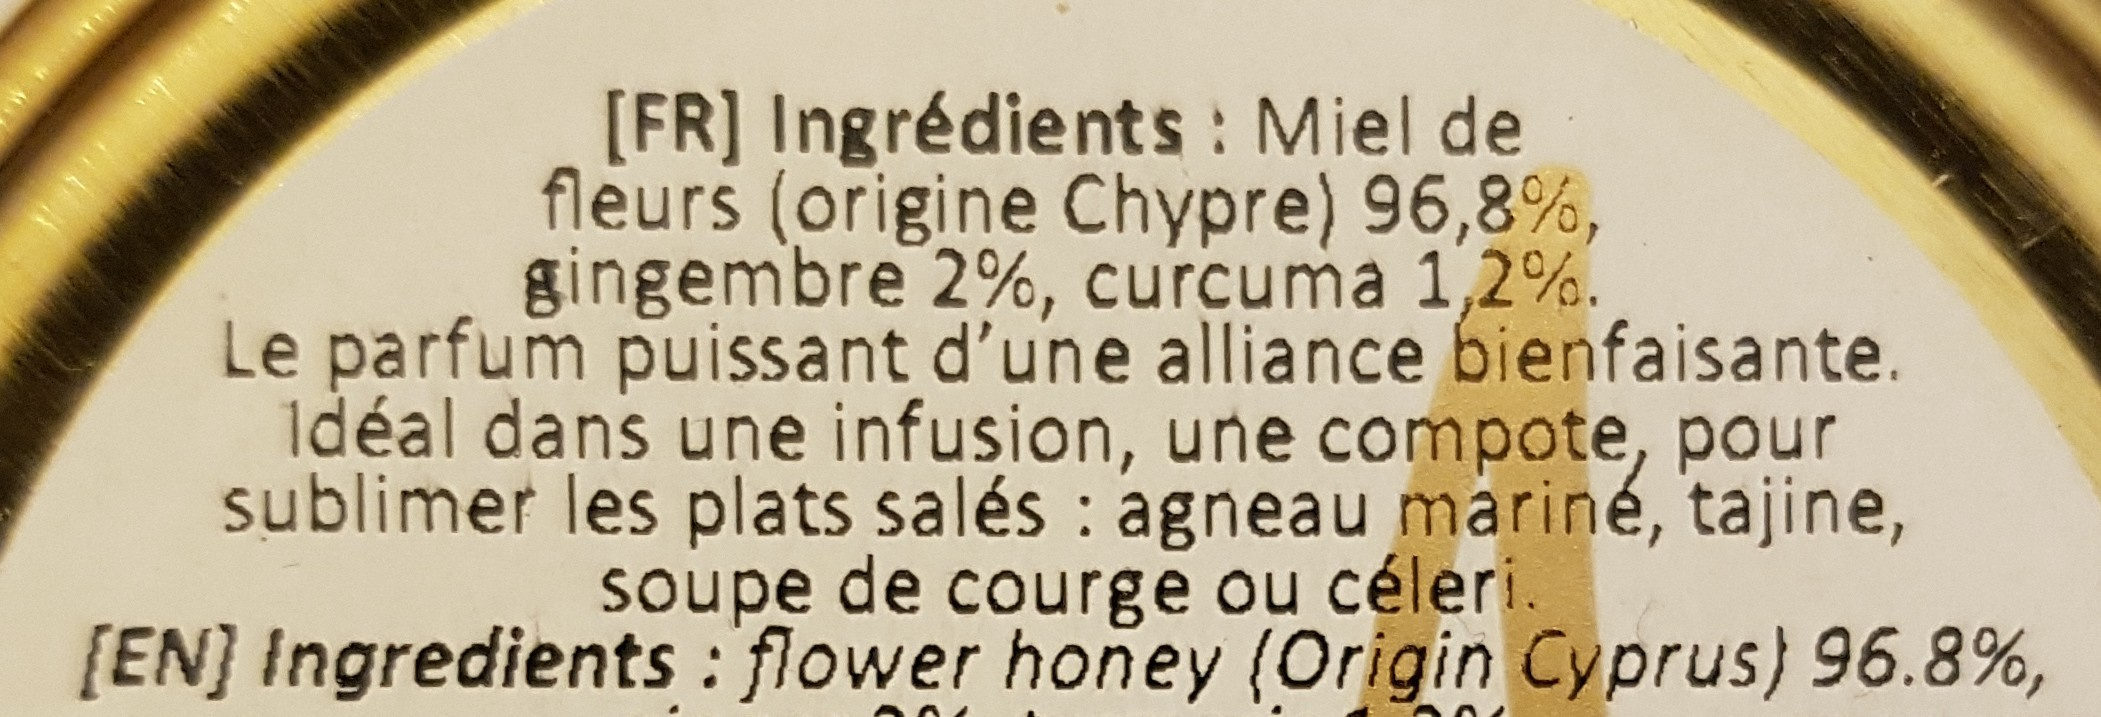 Miel curcuma gingembre - Ingrediënten - fr